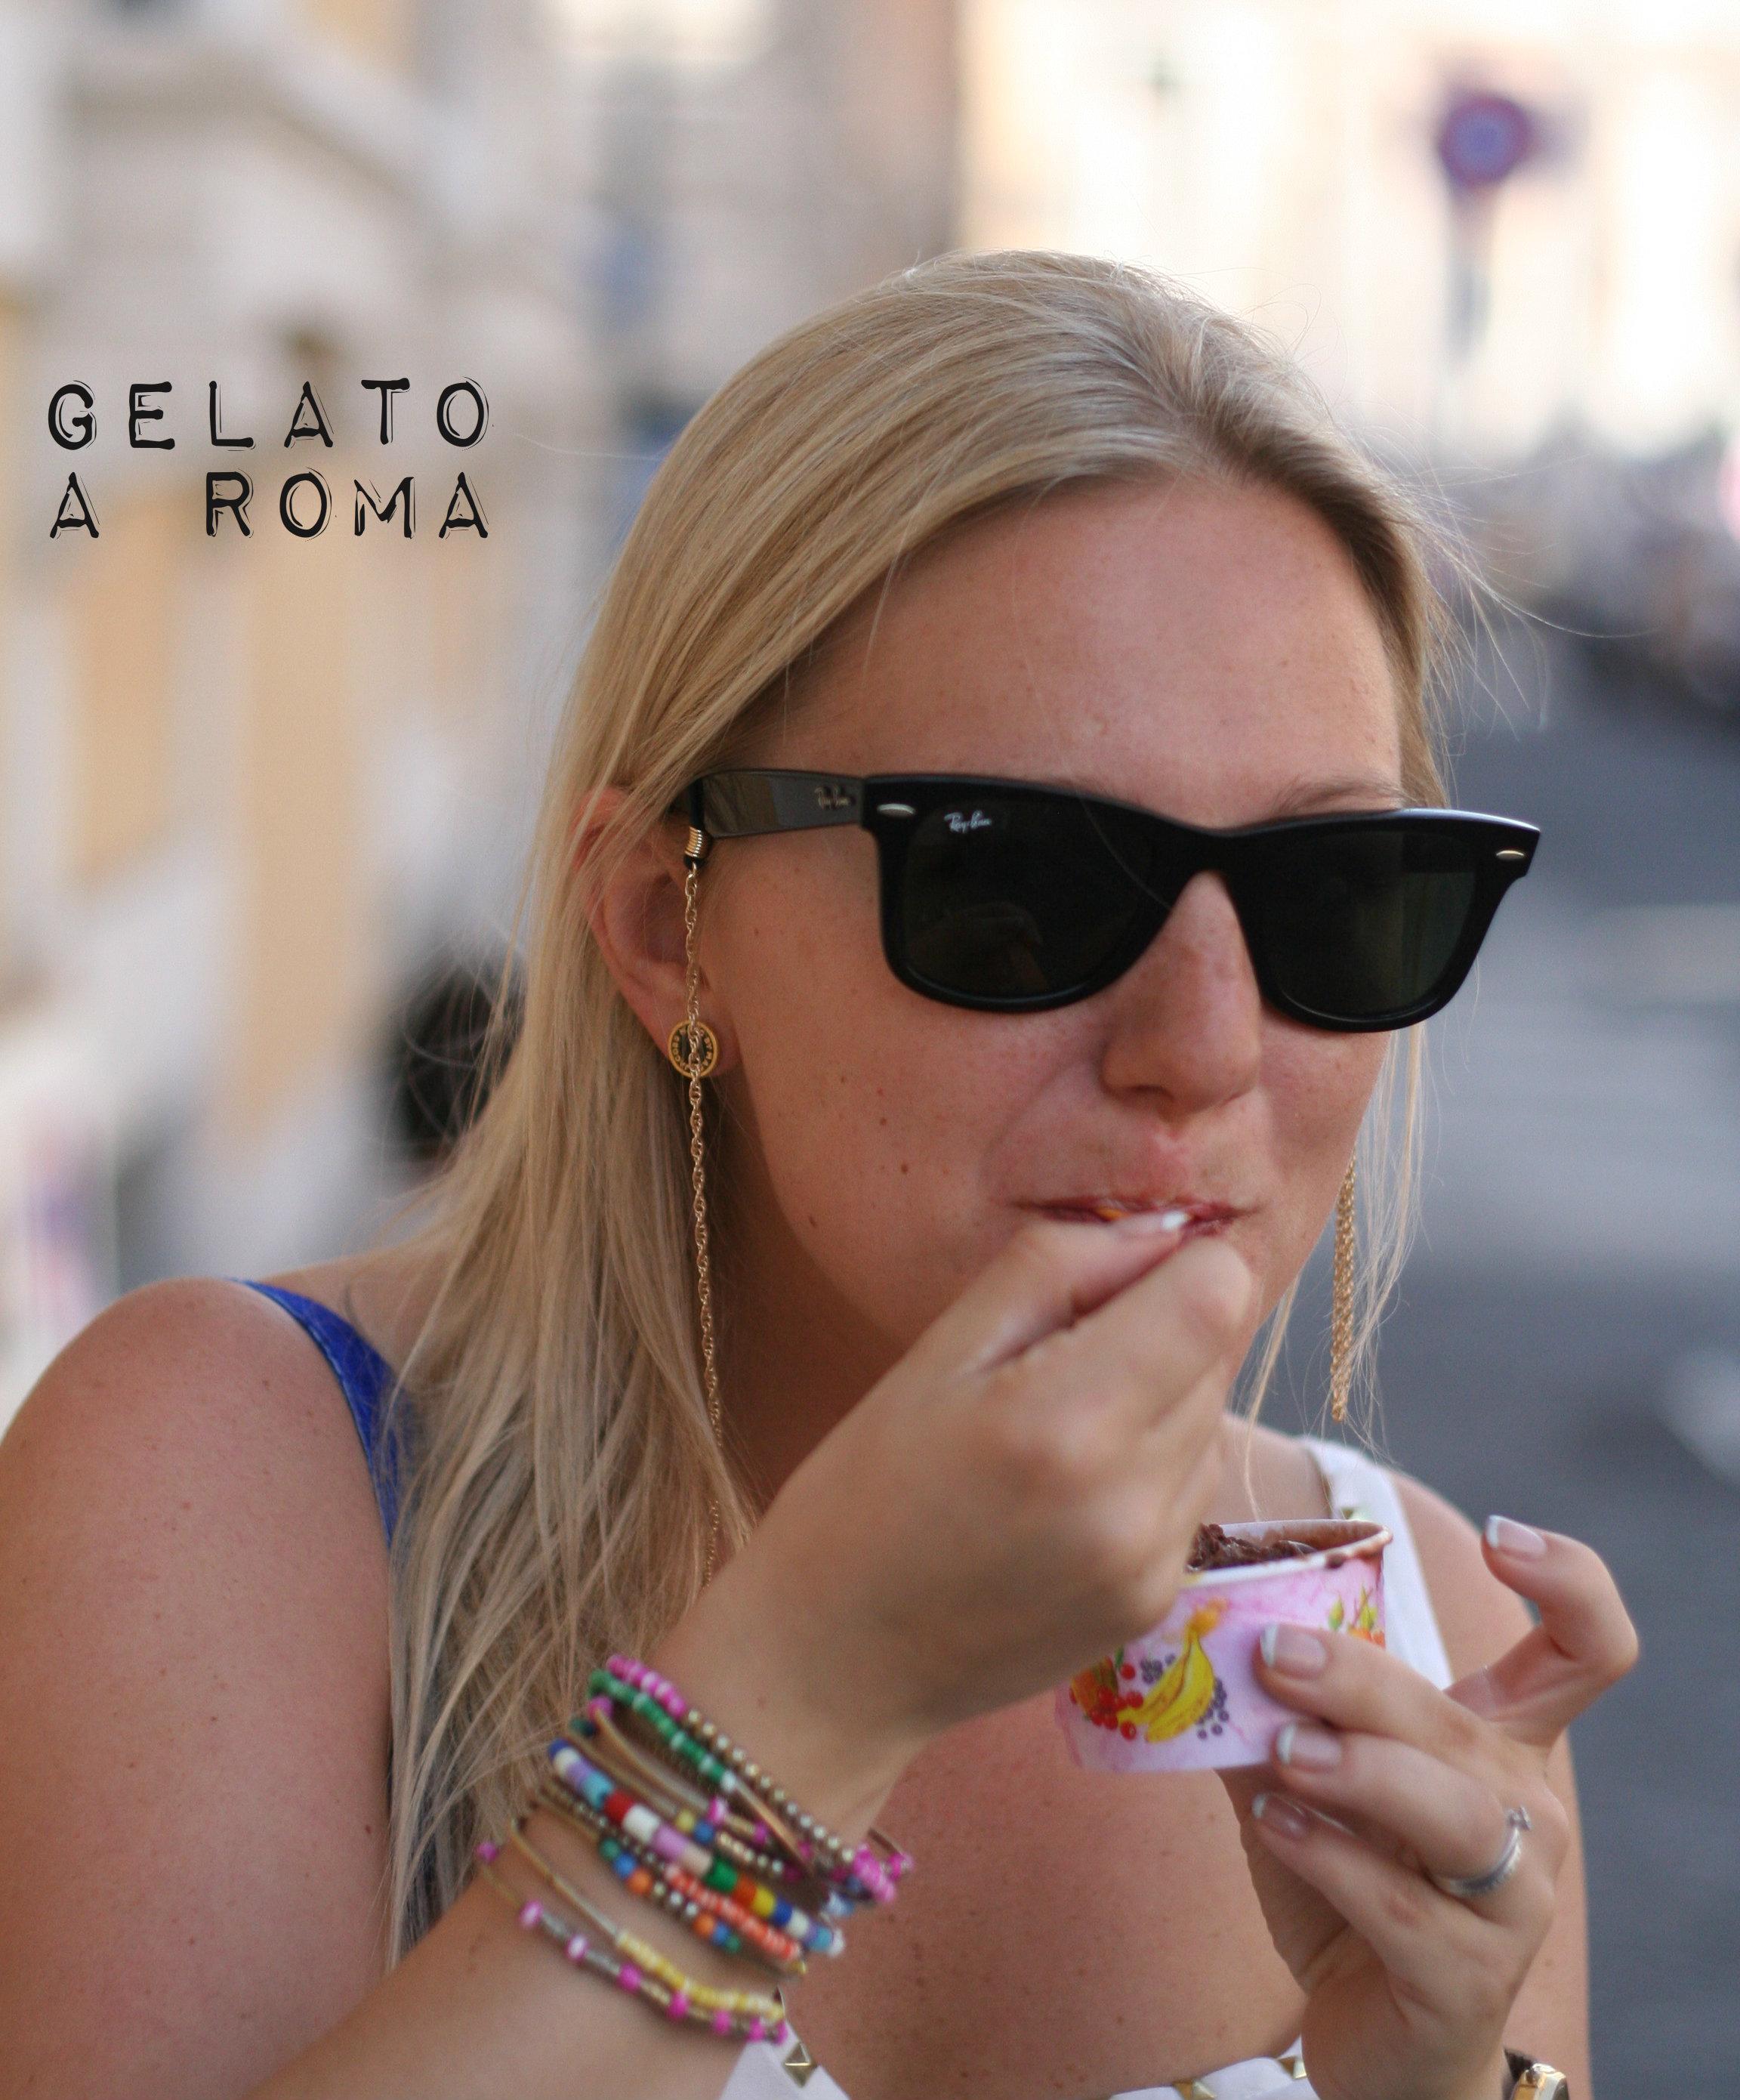 gelato_a_roma_0.jpg